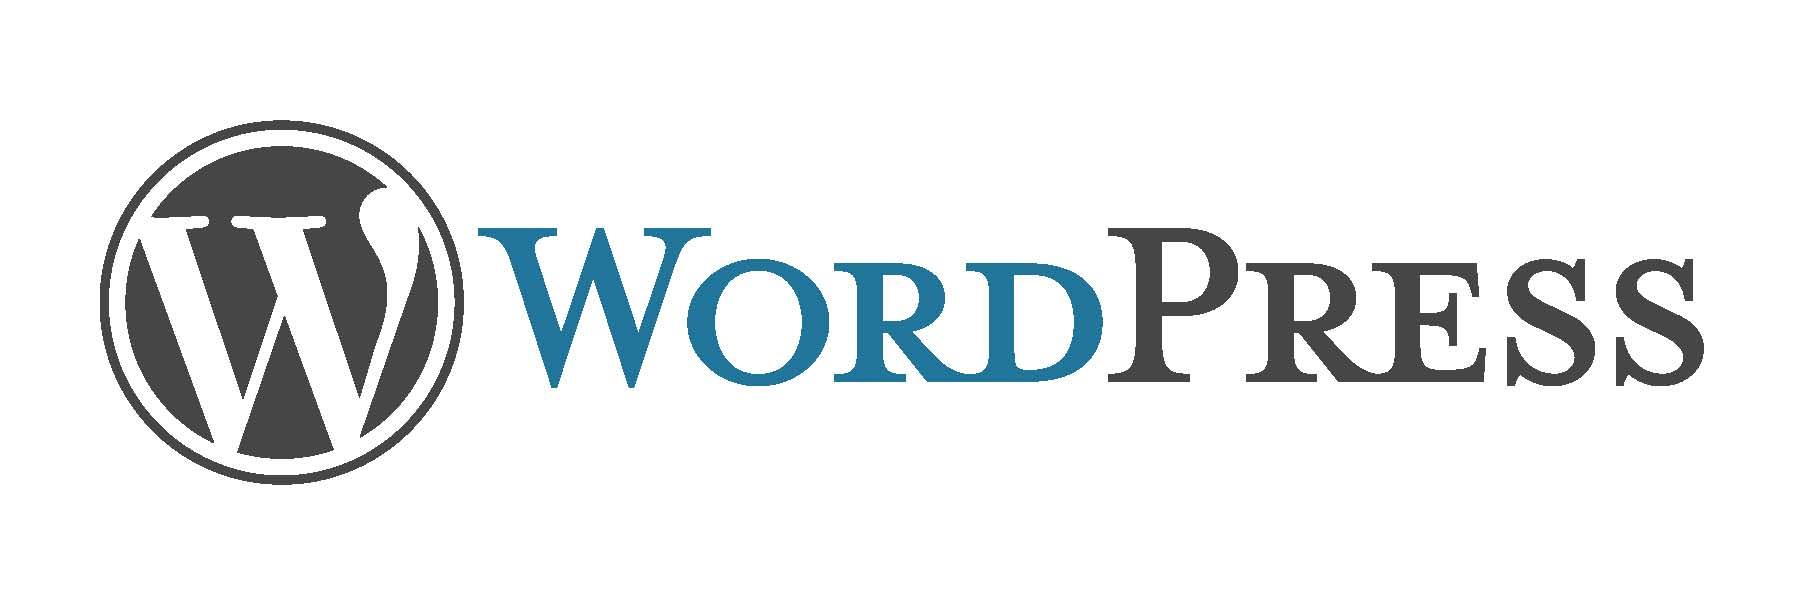 Wordpress G